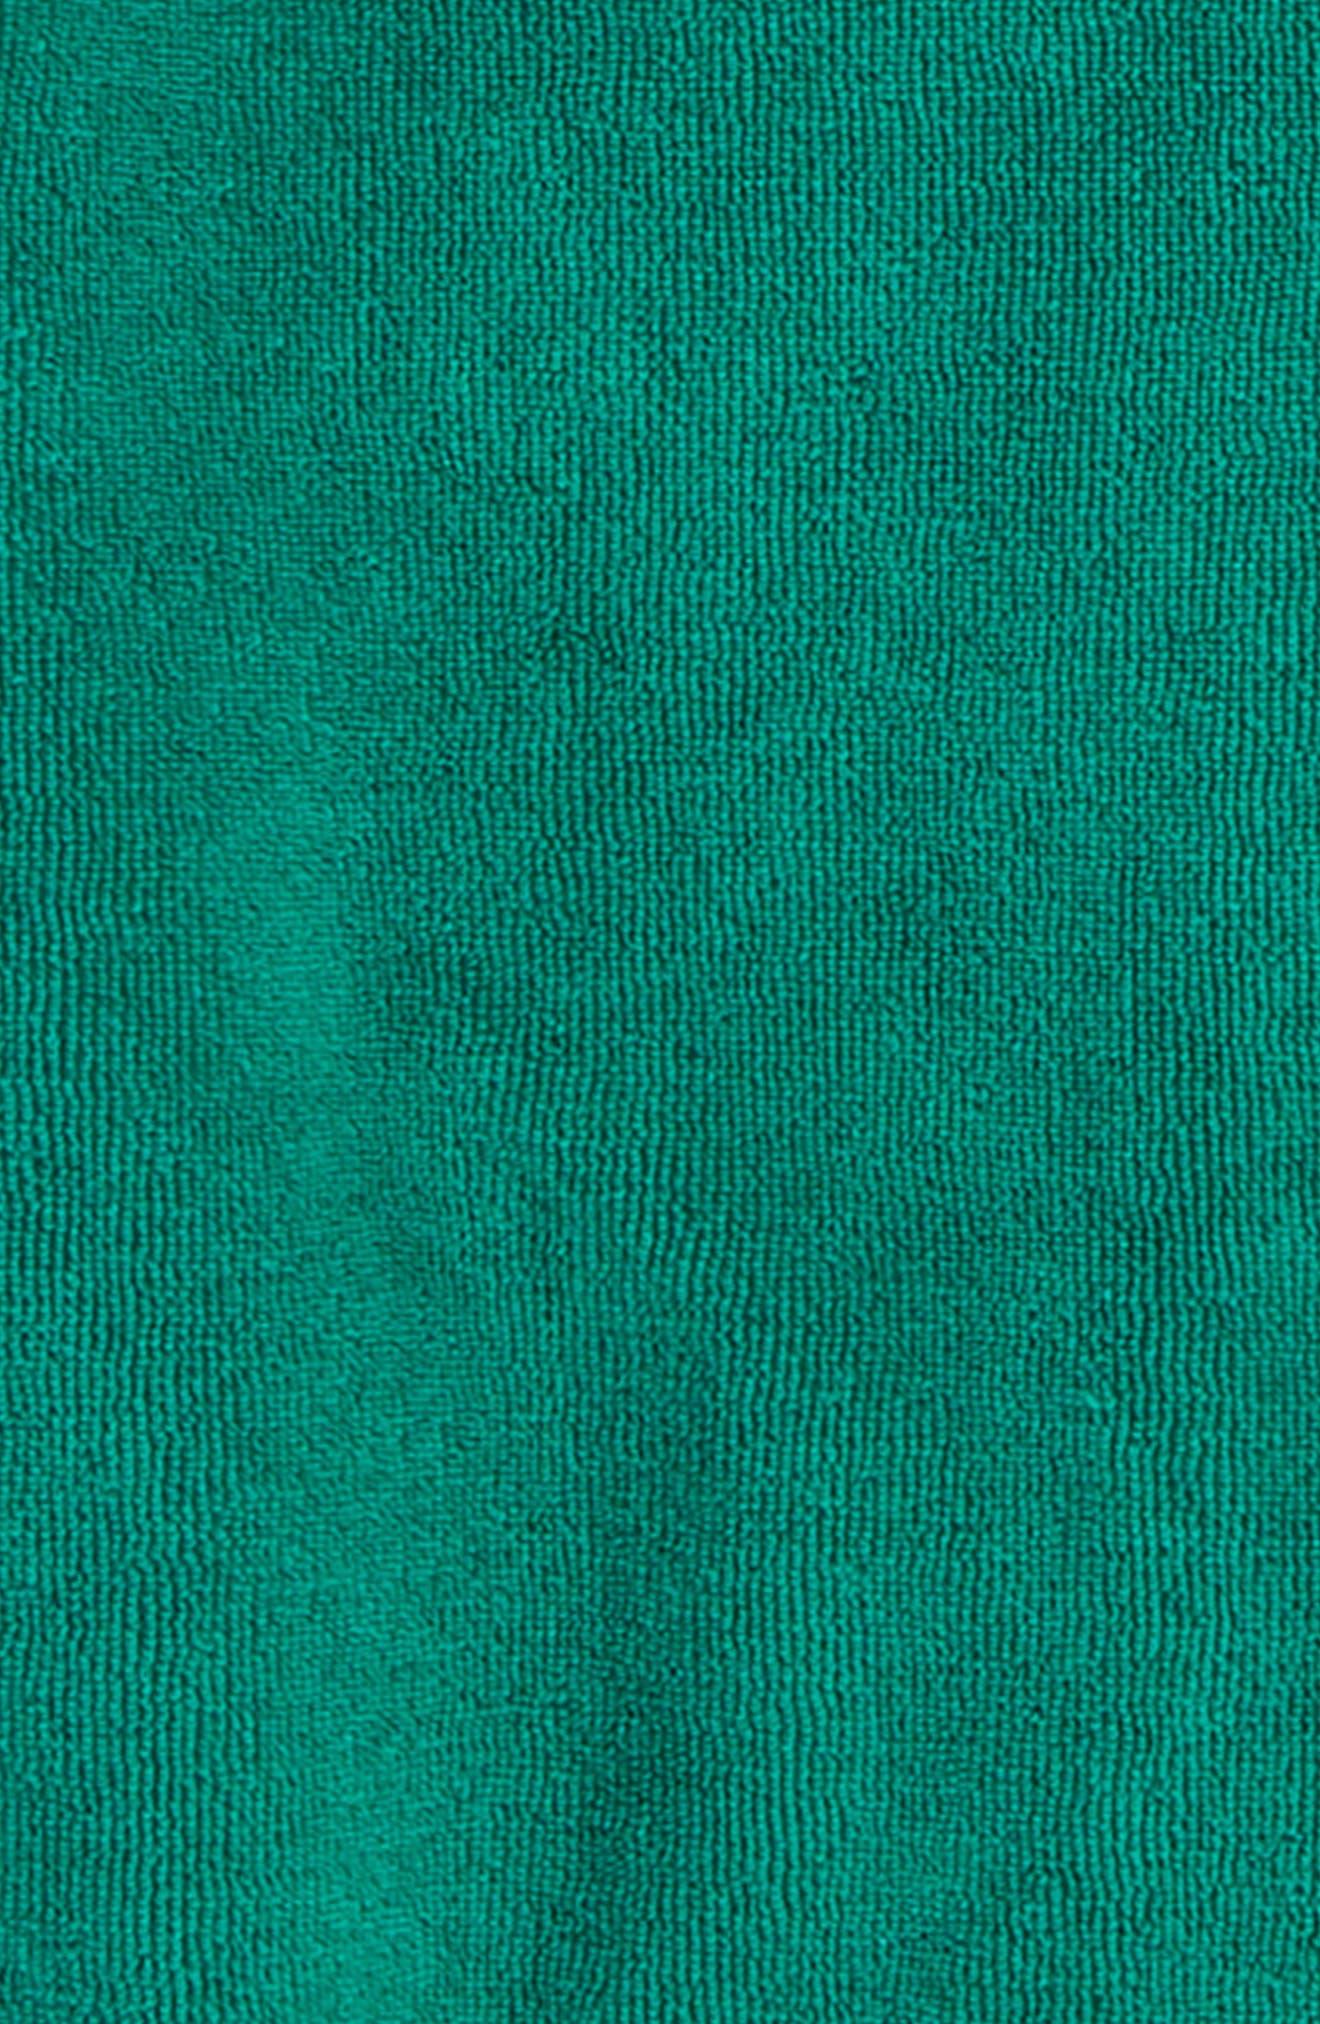 Green Lake Gator Towel Cover-Up,                             Alternate thumbnail 2, color,                             Green Lake Gator